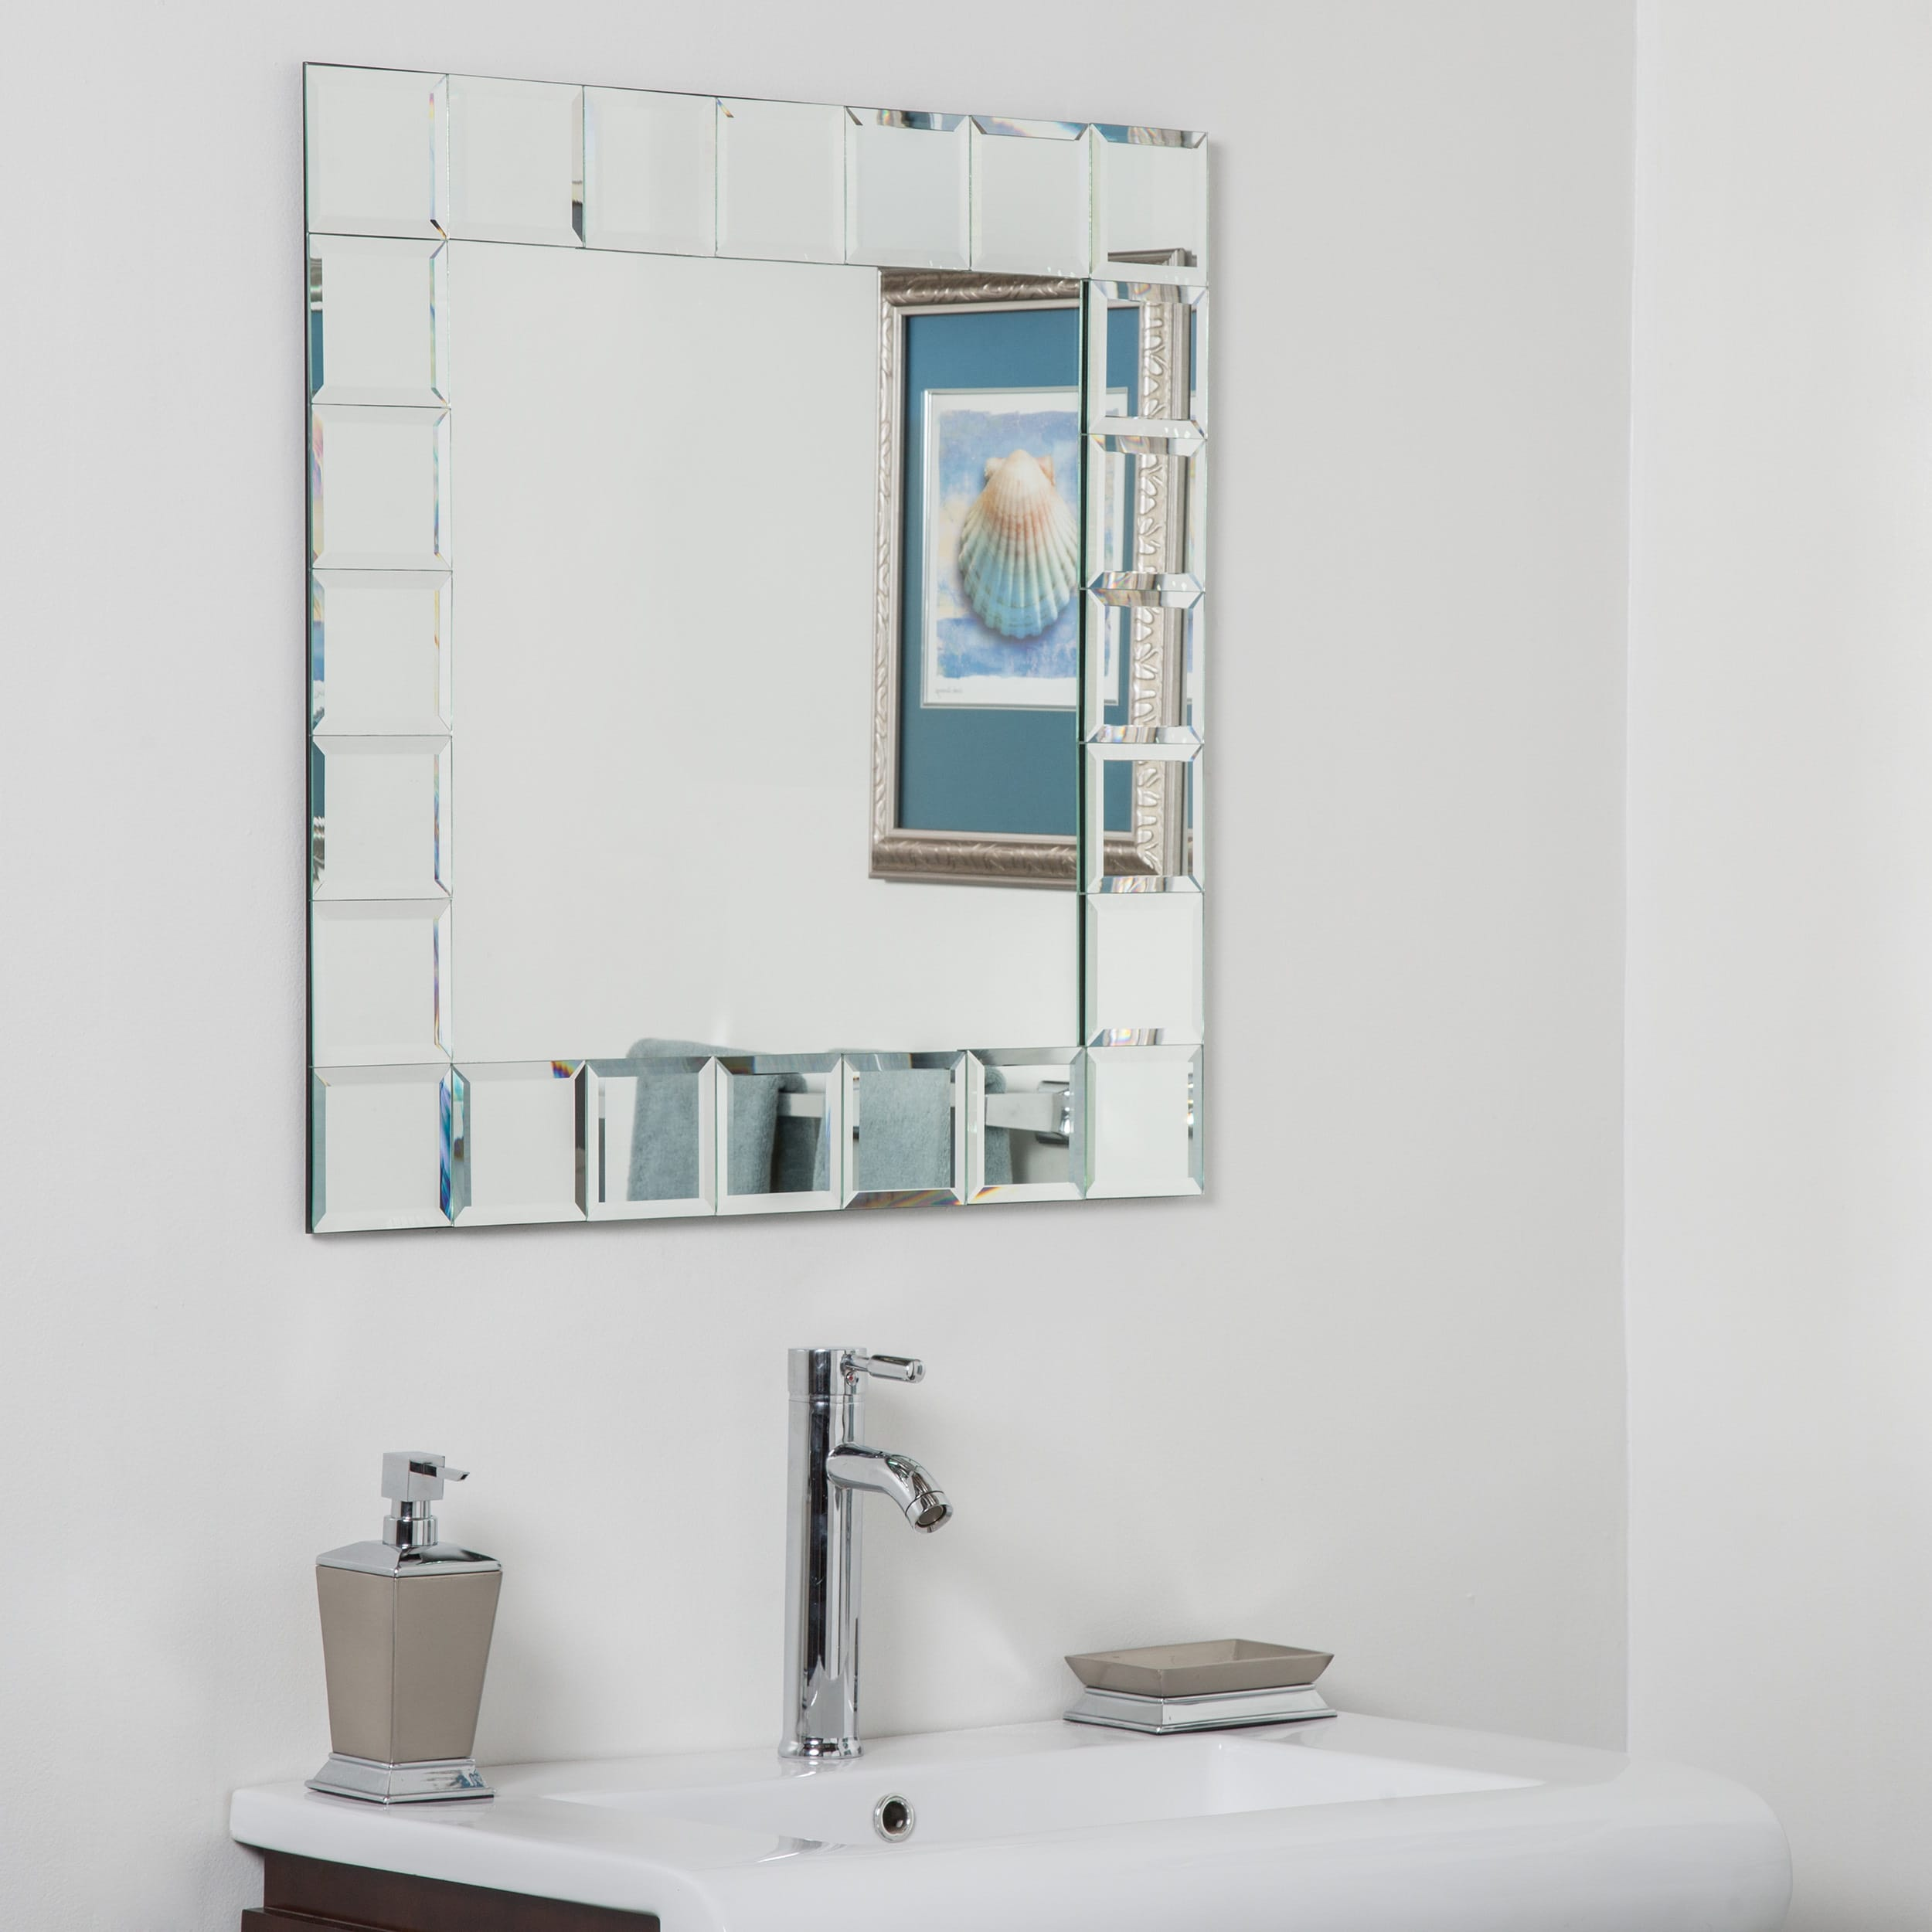 Decor Wonderland Montreal Square Bathroom Mirror by Overstock